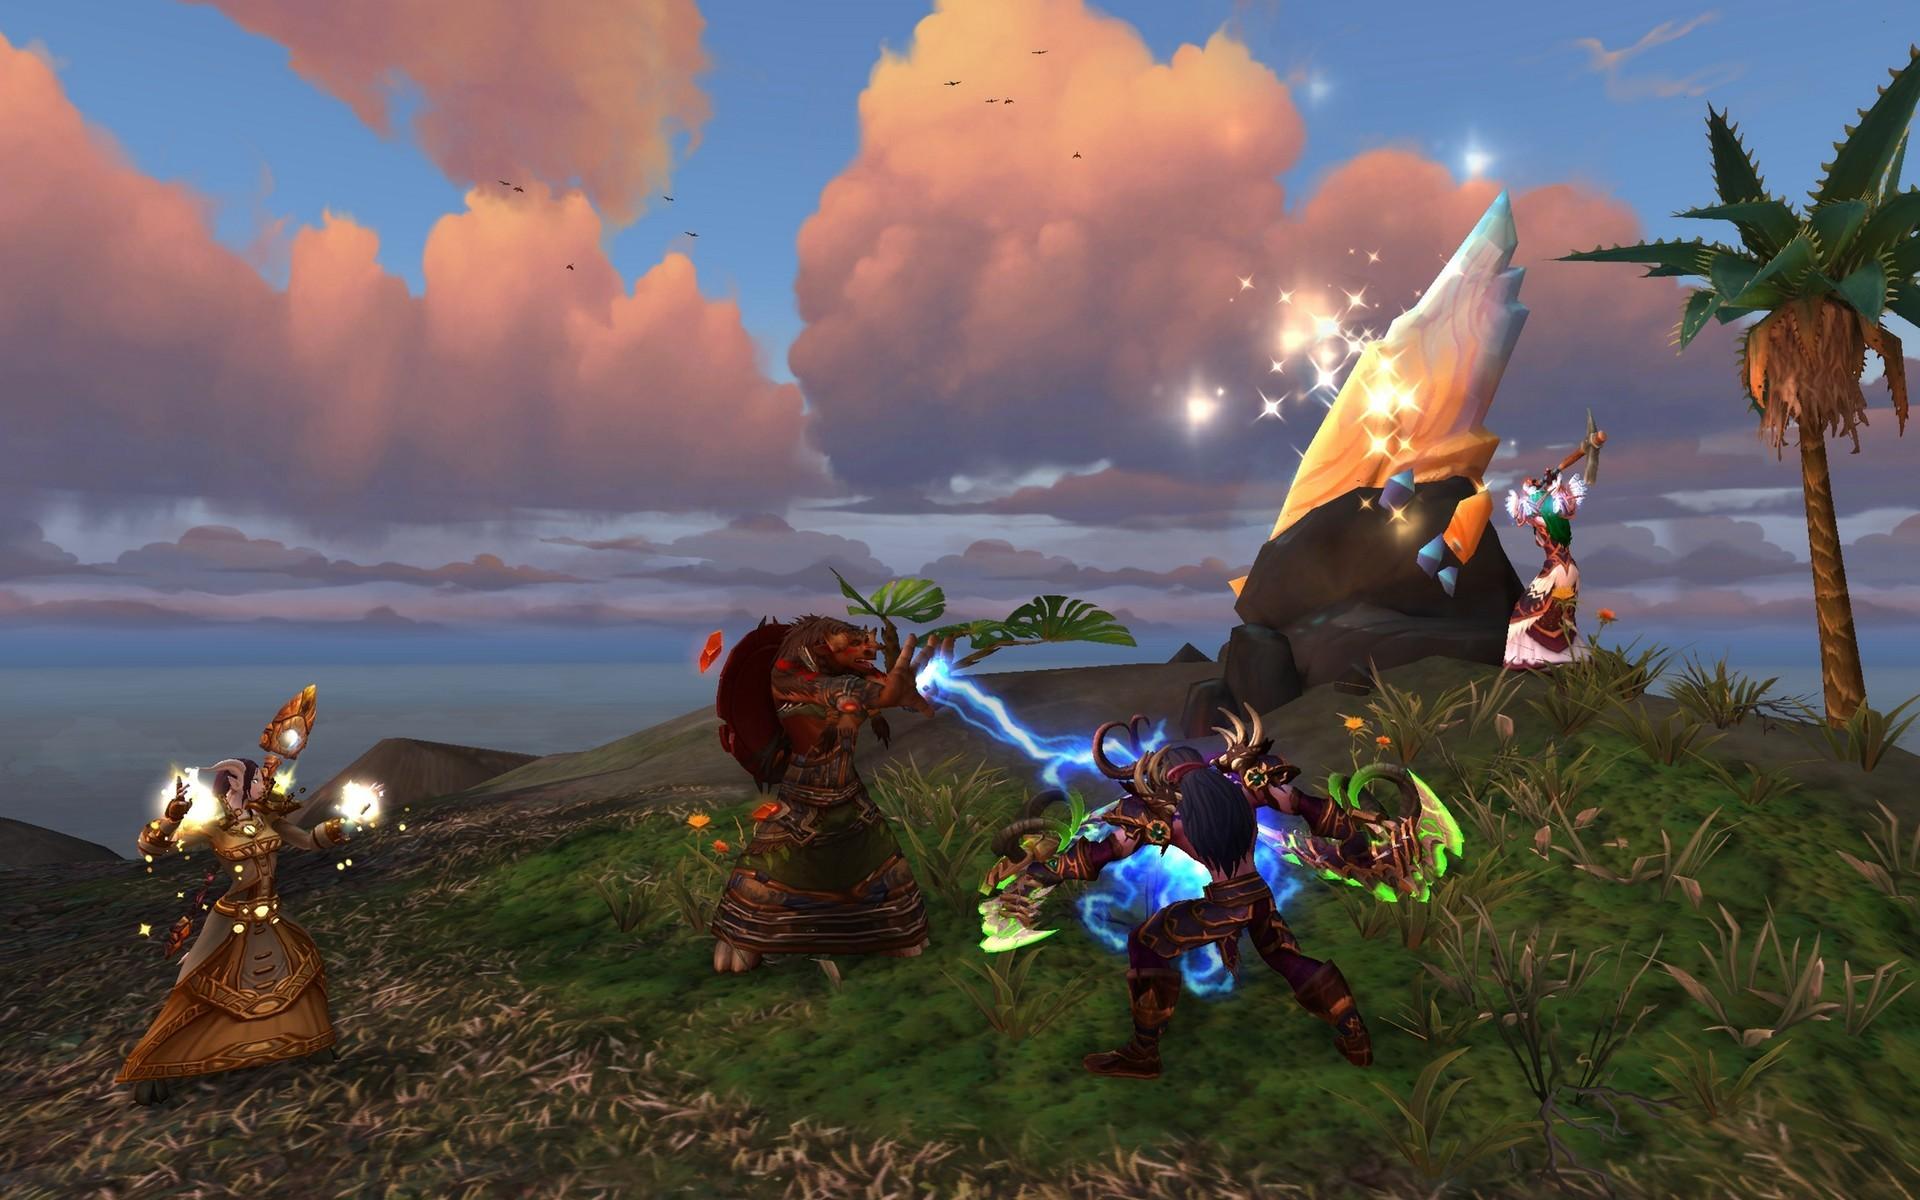 Battle for Azeroth для World of Warcraft выйдет 14 августа